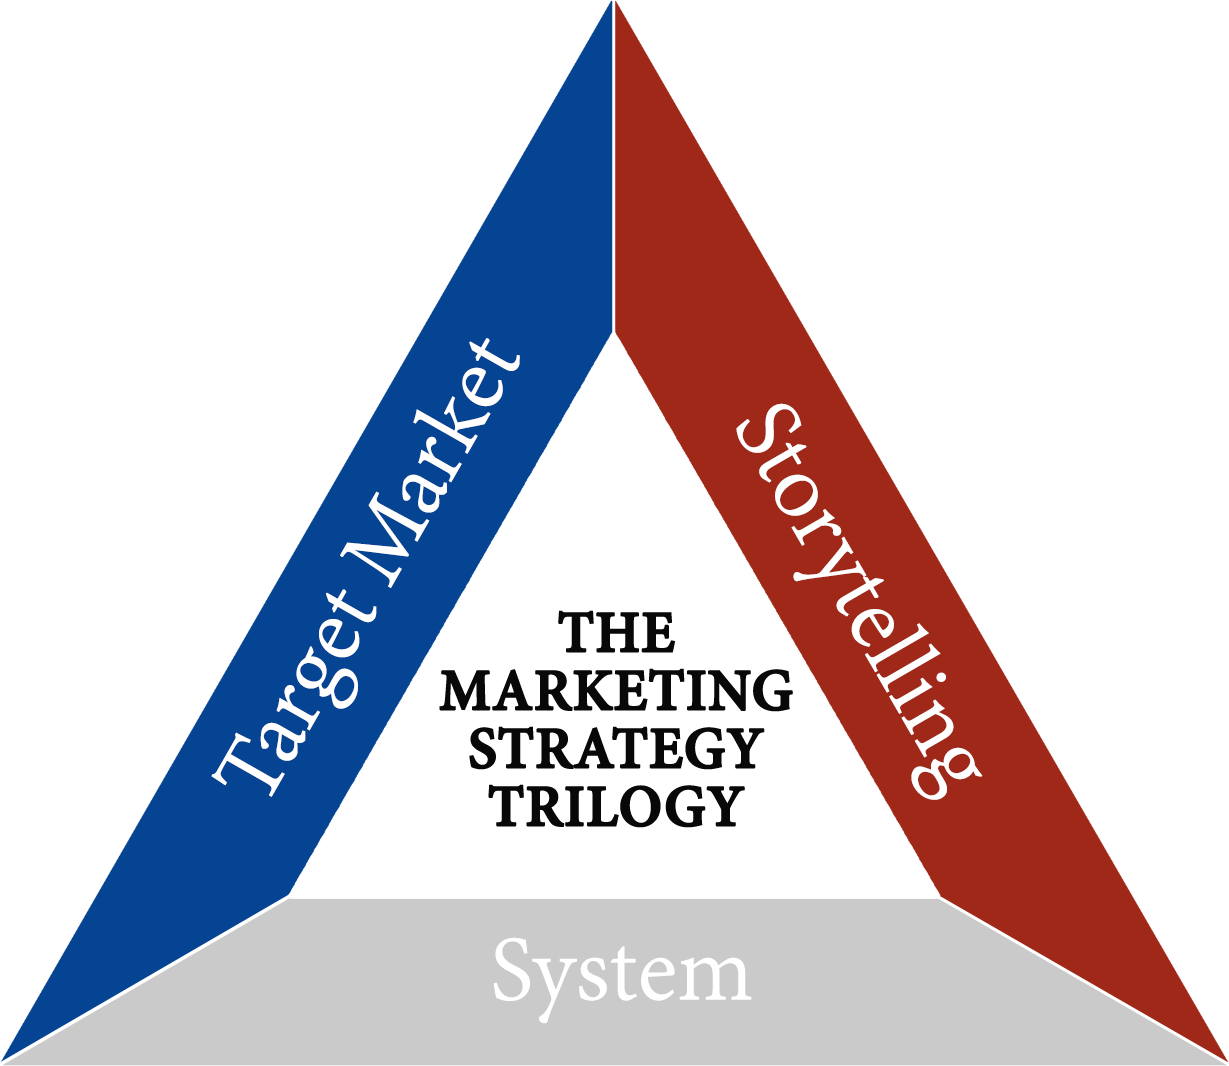 Marketing Strategy Trilogy - Target Market, Storytelling, System